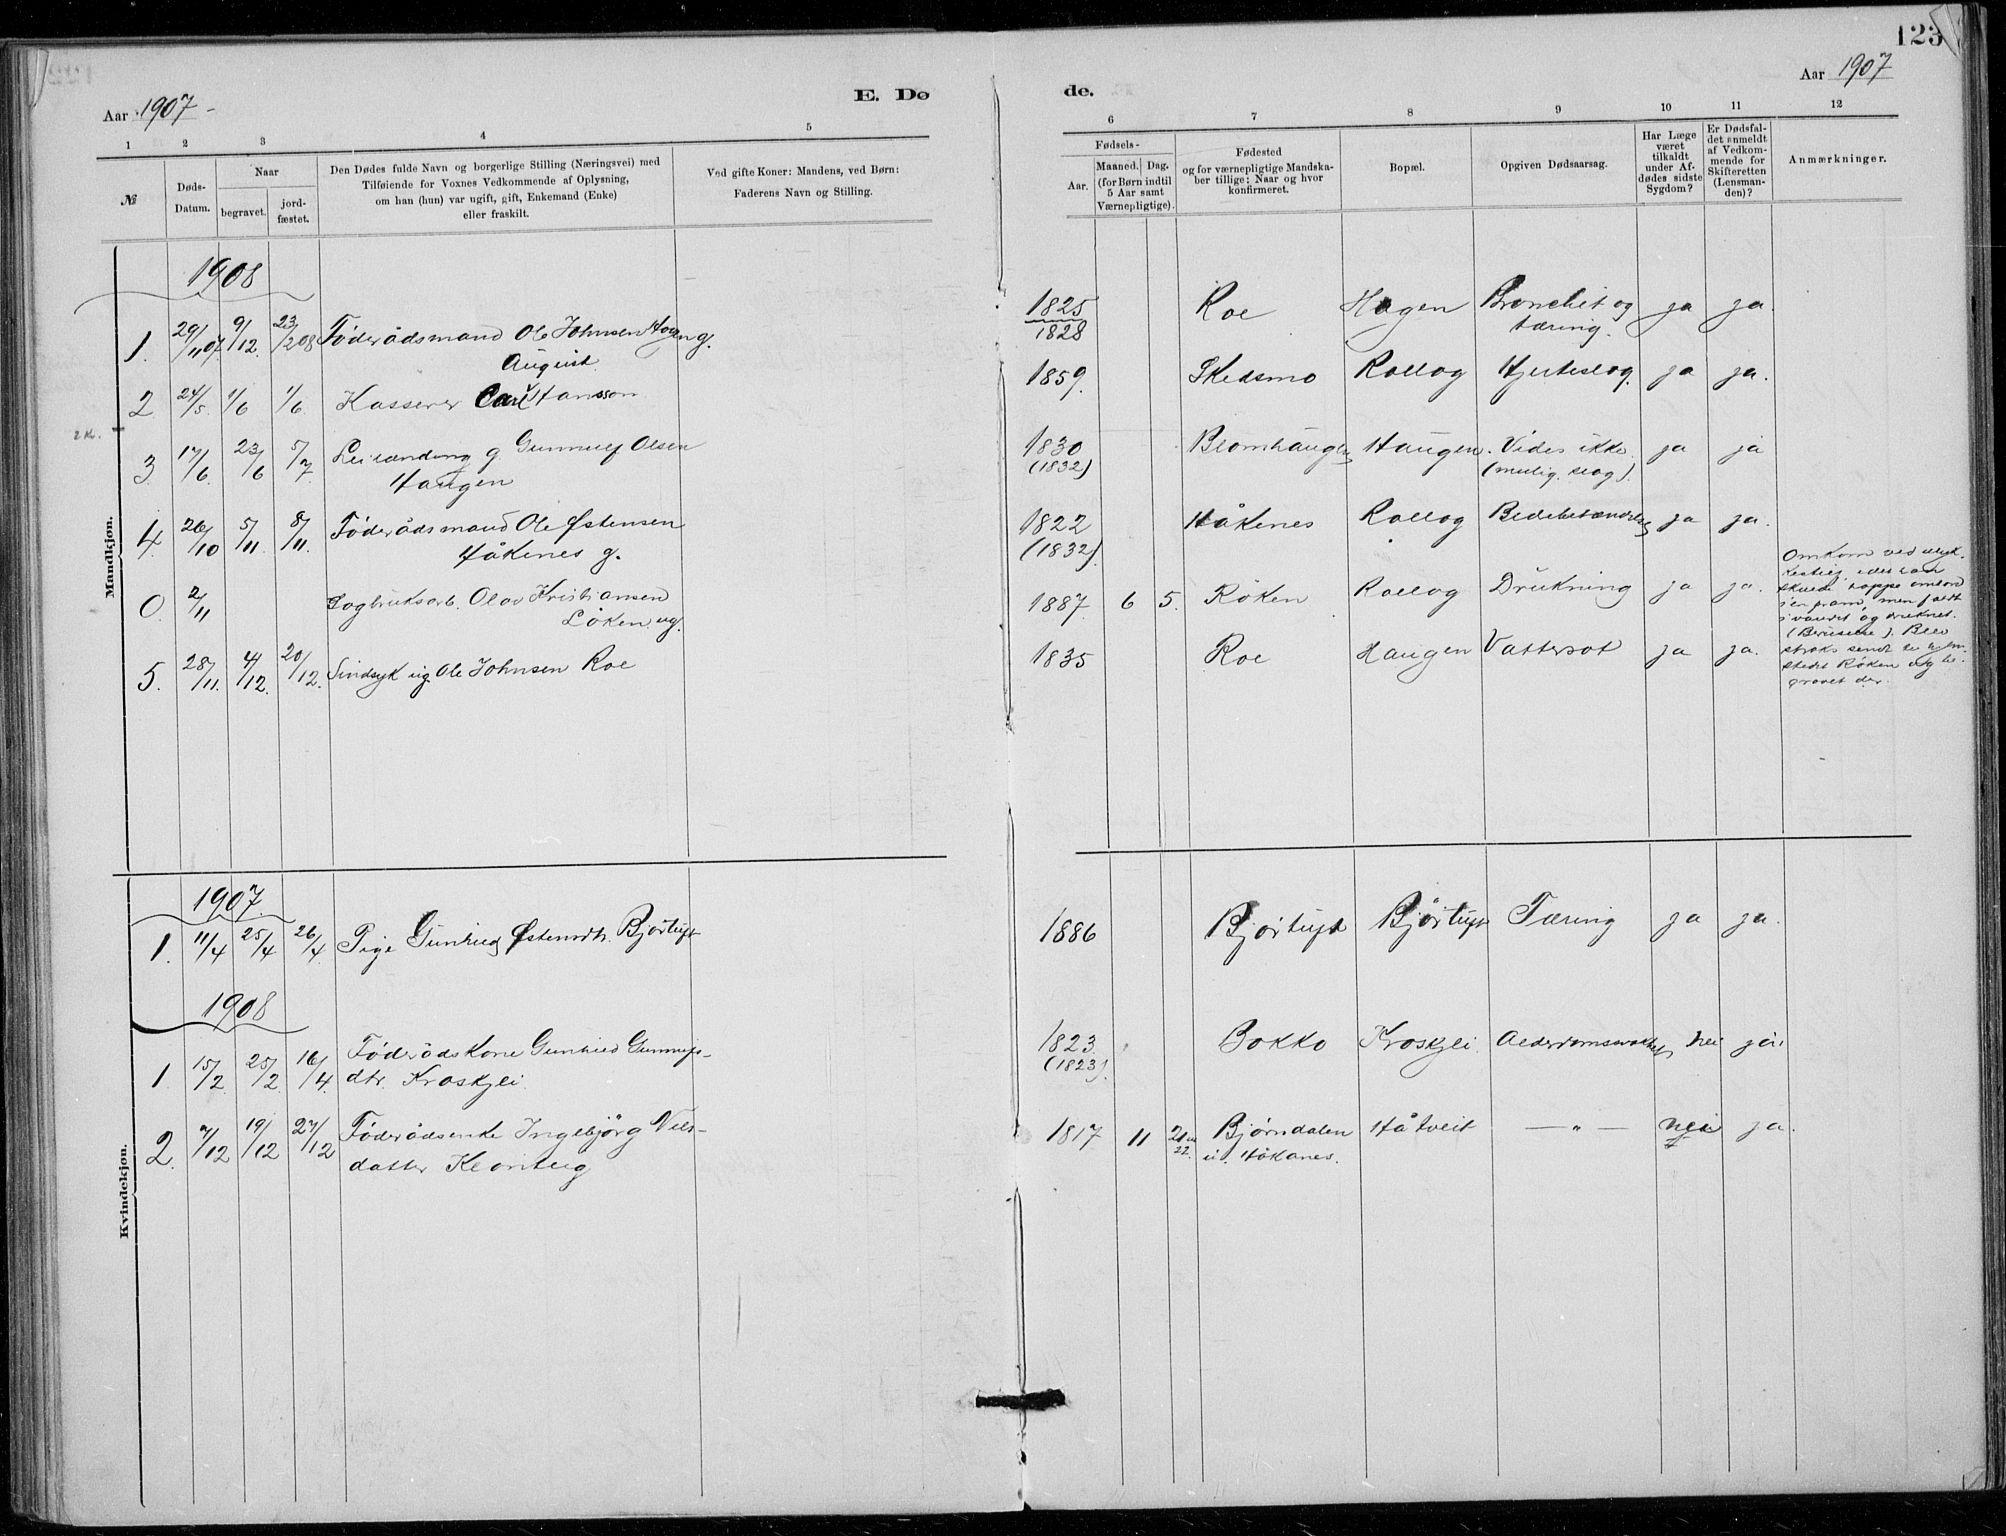 SAKO, Tinn kirkebøker, F/Fb/L0002: Ministerialbok nr. II 2, 1878-1917, s. 123